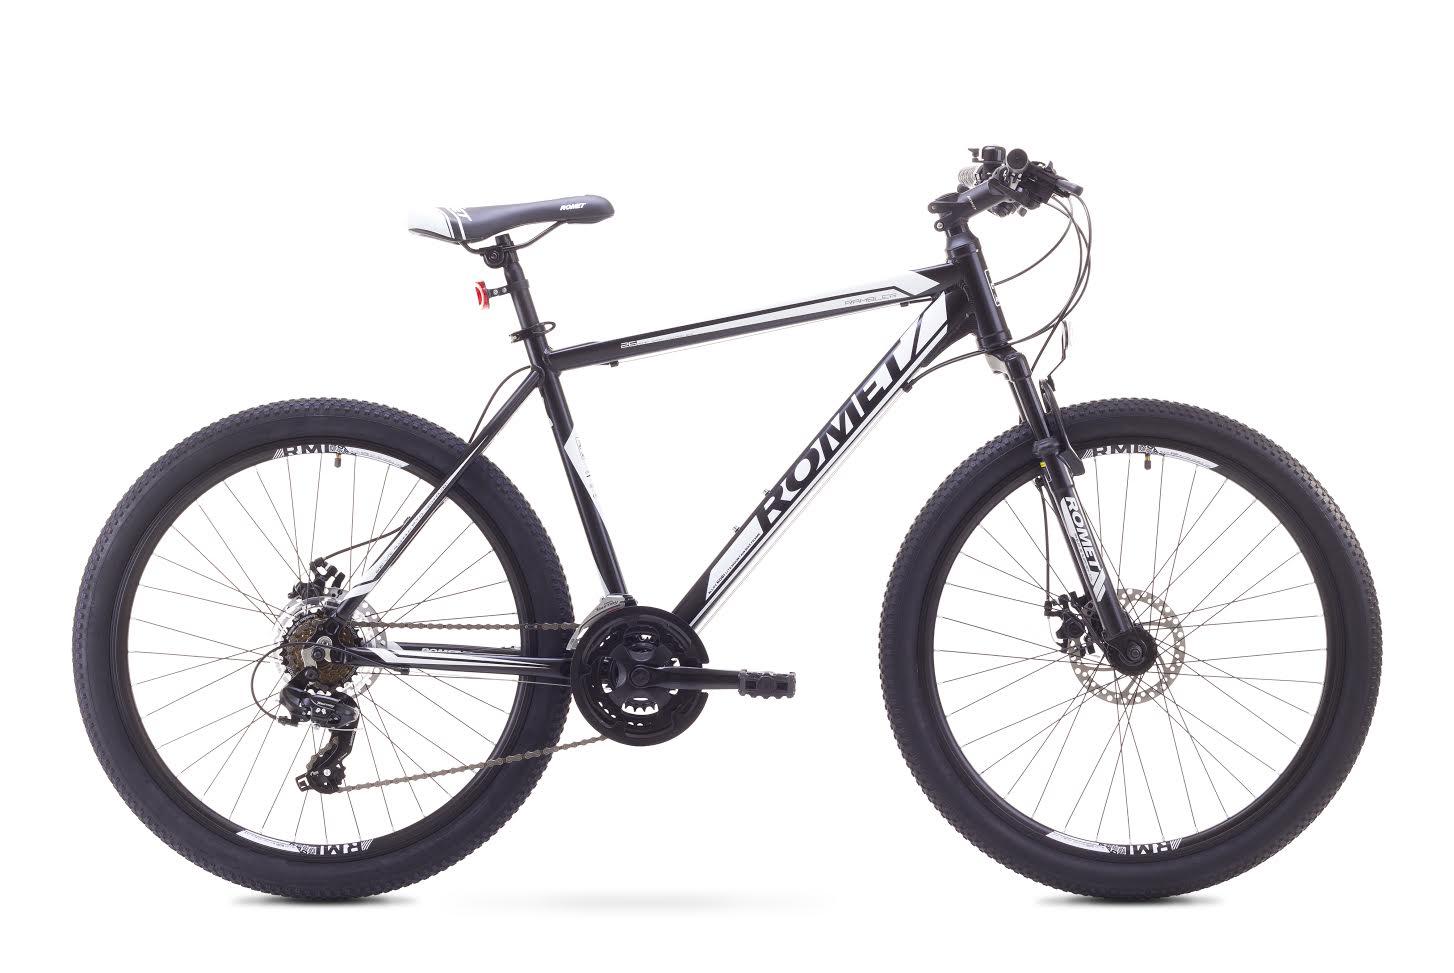 ROMET RAMBLER 26 2 MTB 17-M R26 MELNS/BALTS kalnu velosipēds MTB